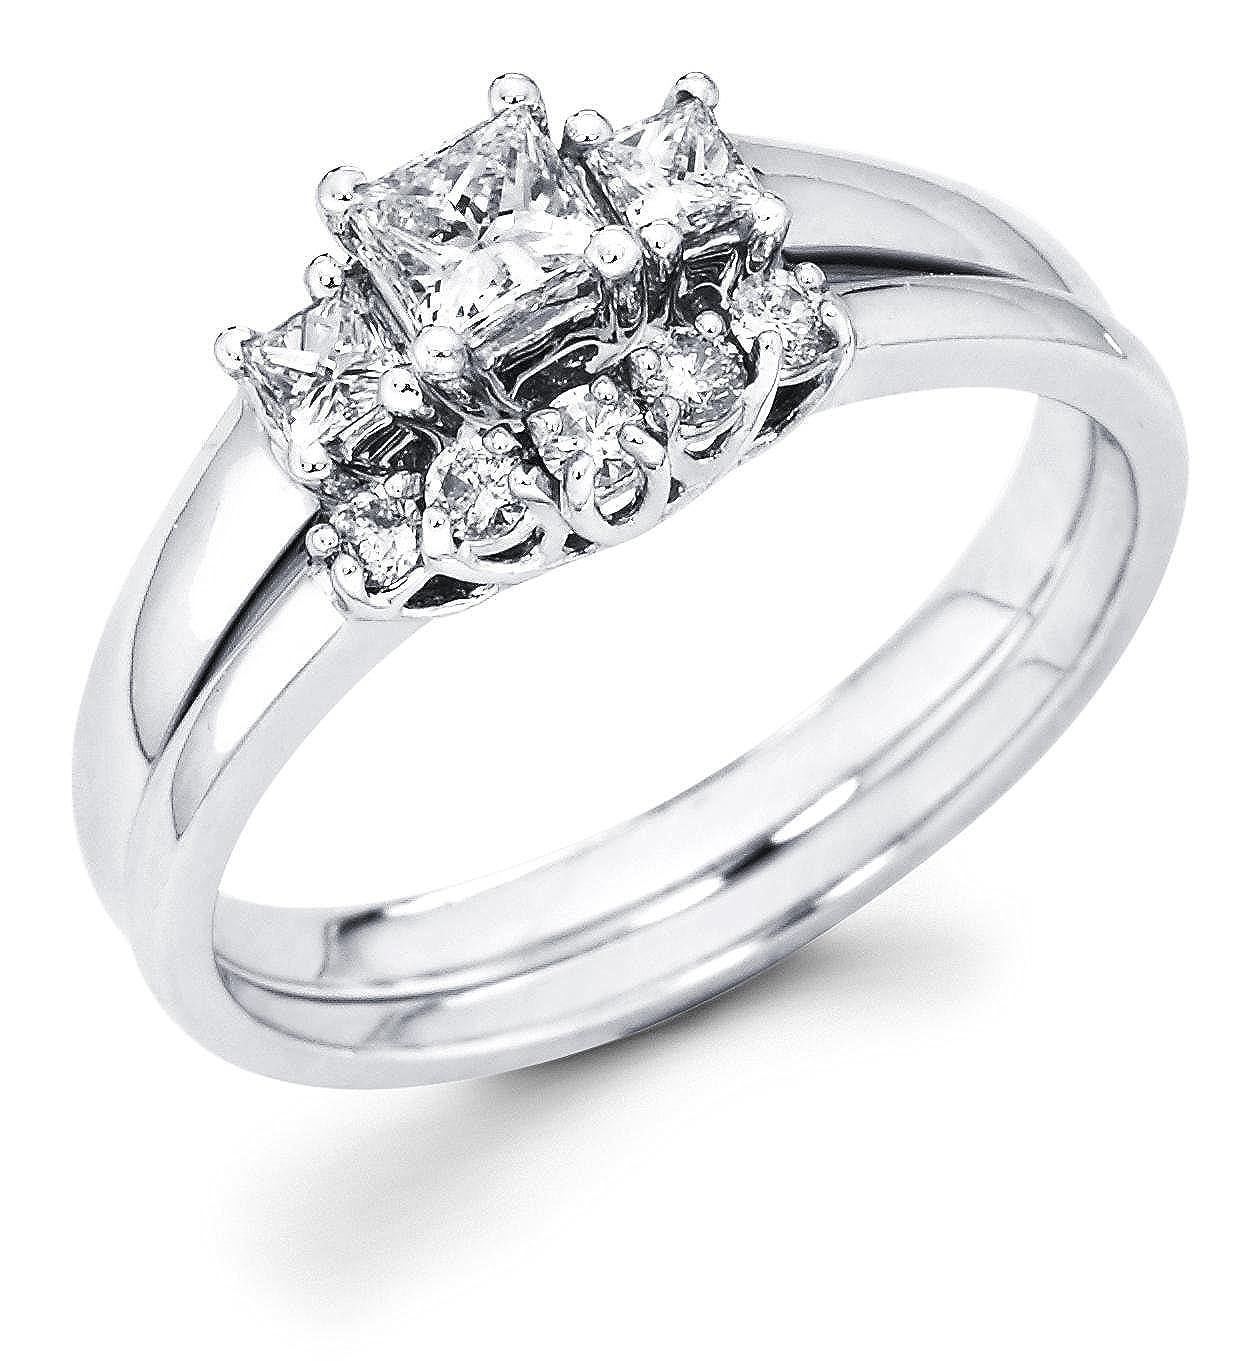 18d281319 14k White Gold Three 3 Stone Princess Cut Diamond Engagement Anniversary 2 Ring  Set w/Matching 5 Round Diamond Wedding Band (1/2 cttw, G-H Color, ...